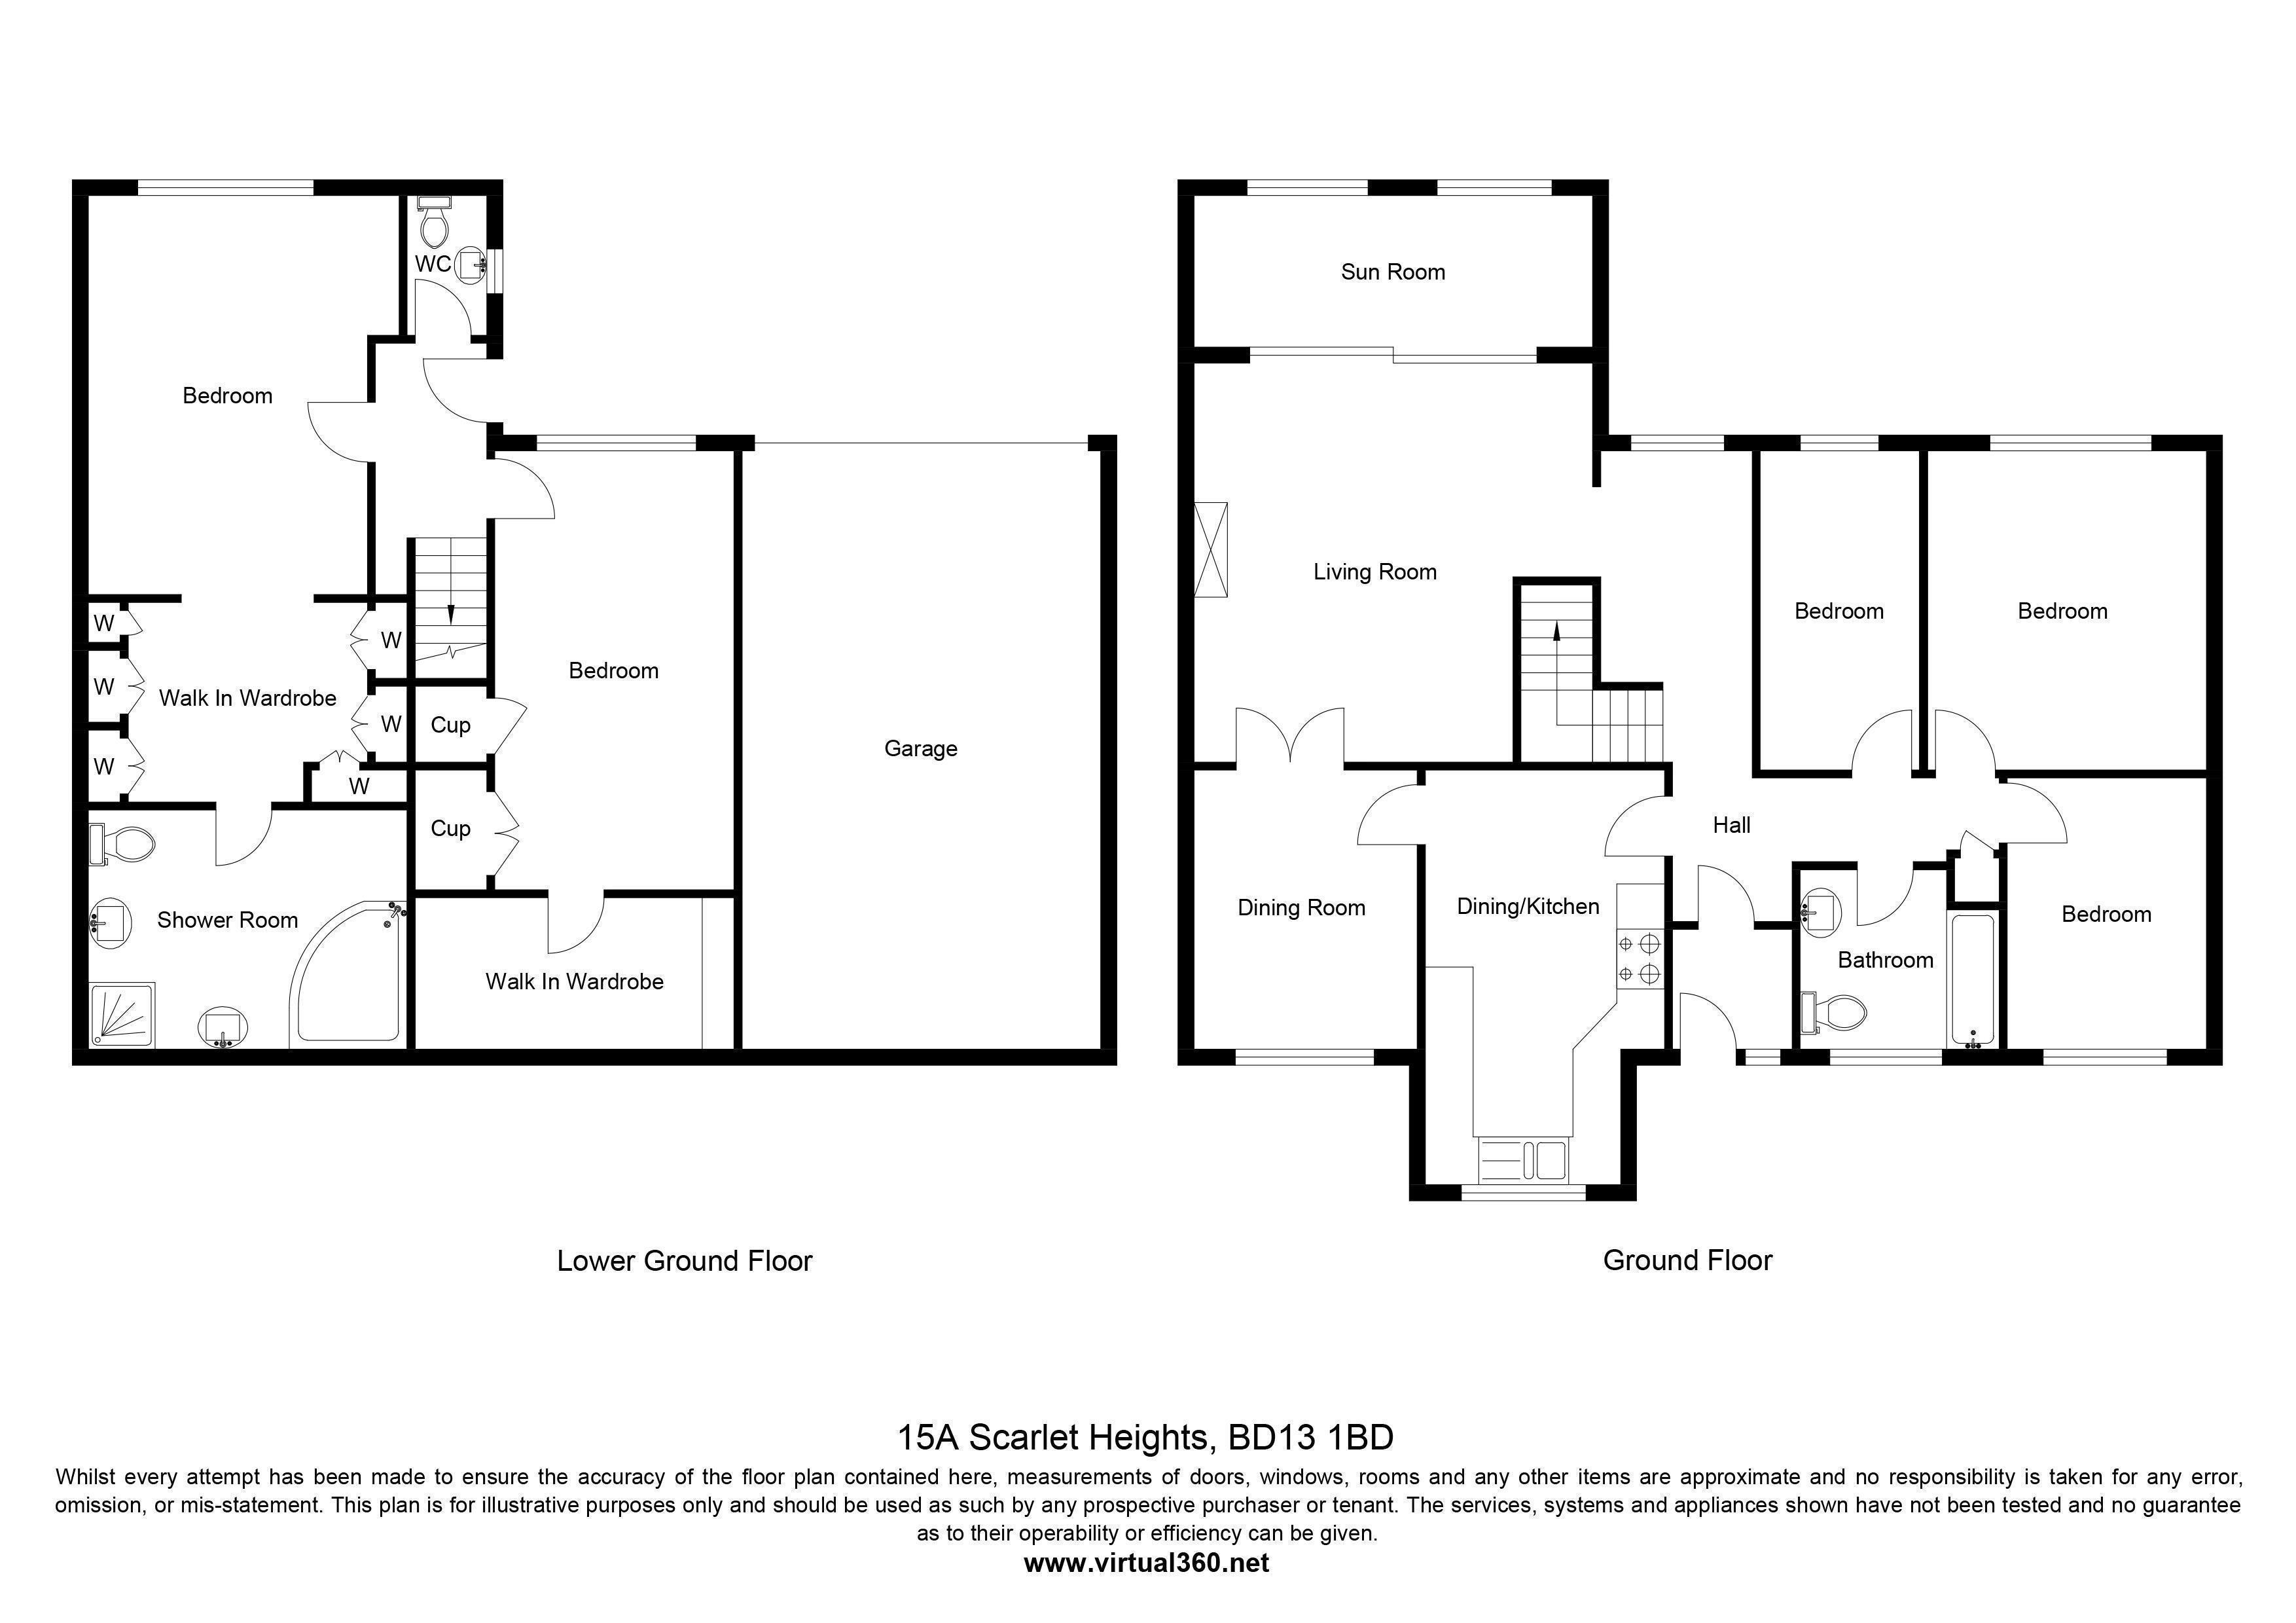 Scarlet Heights Queensbury Bradford Bd13 5 Bedroom